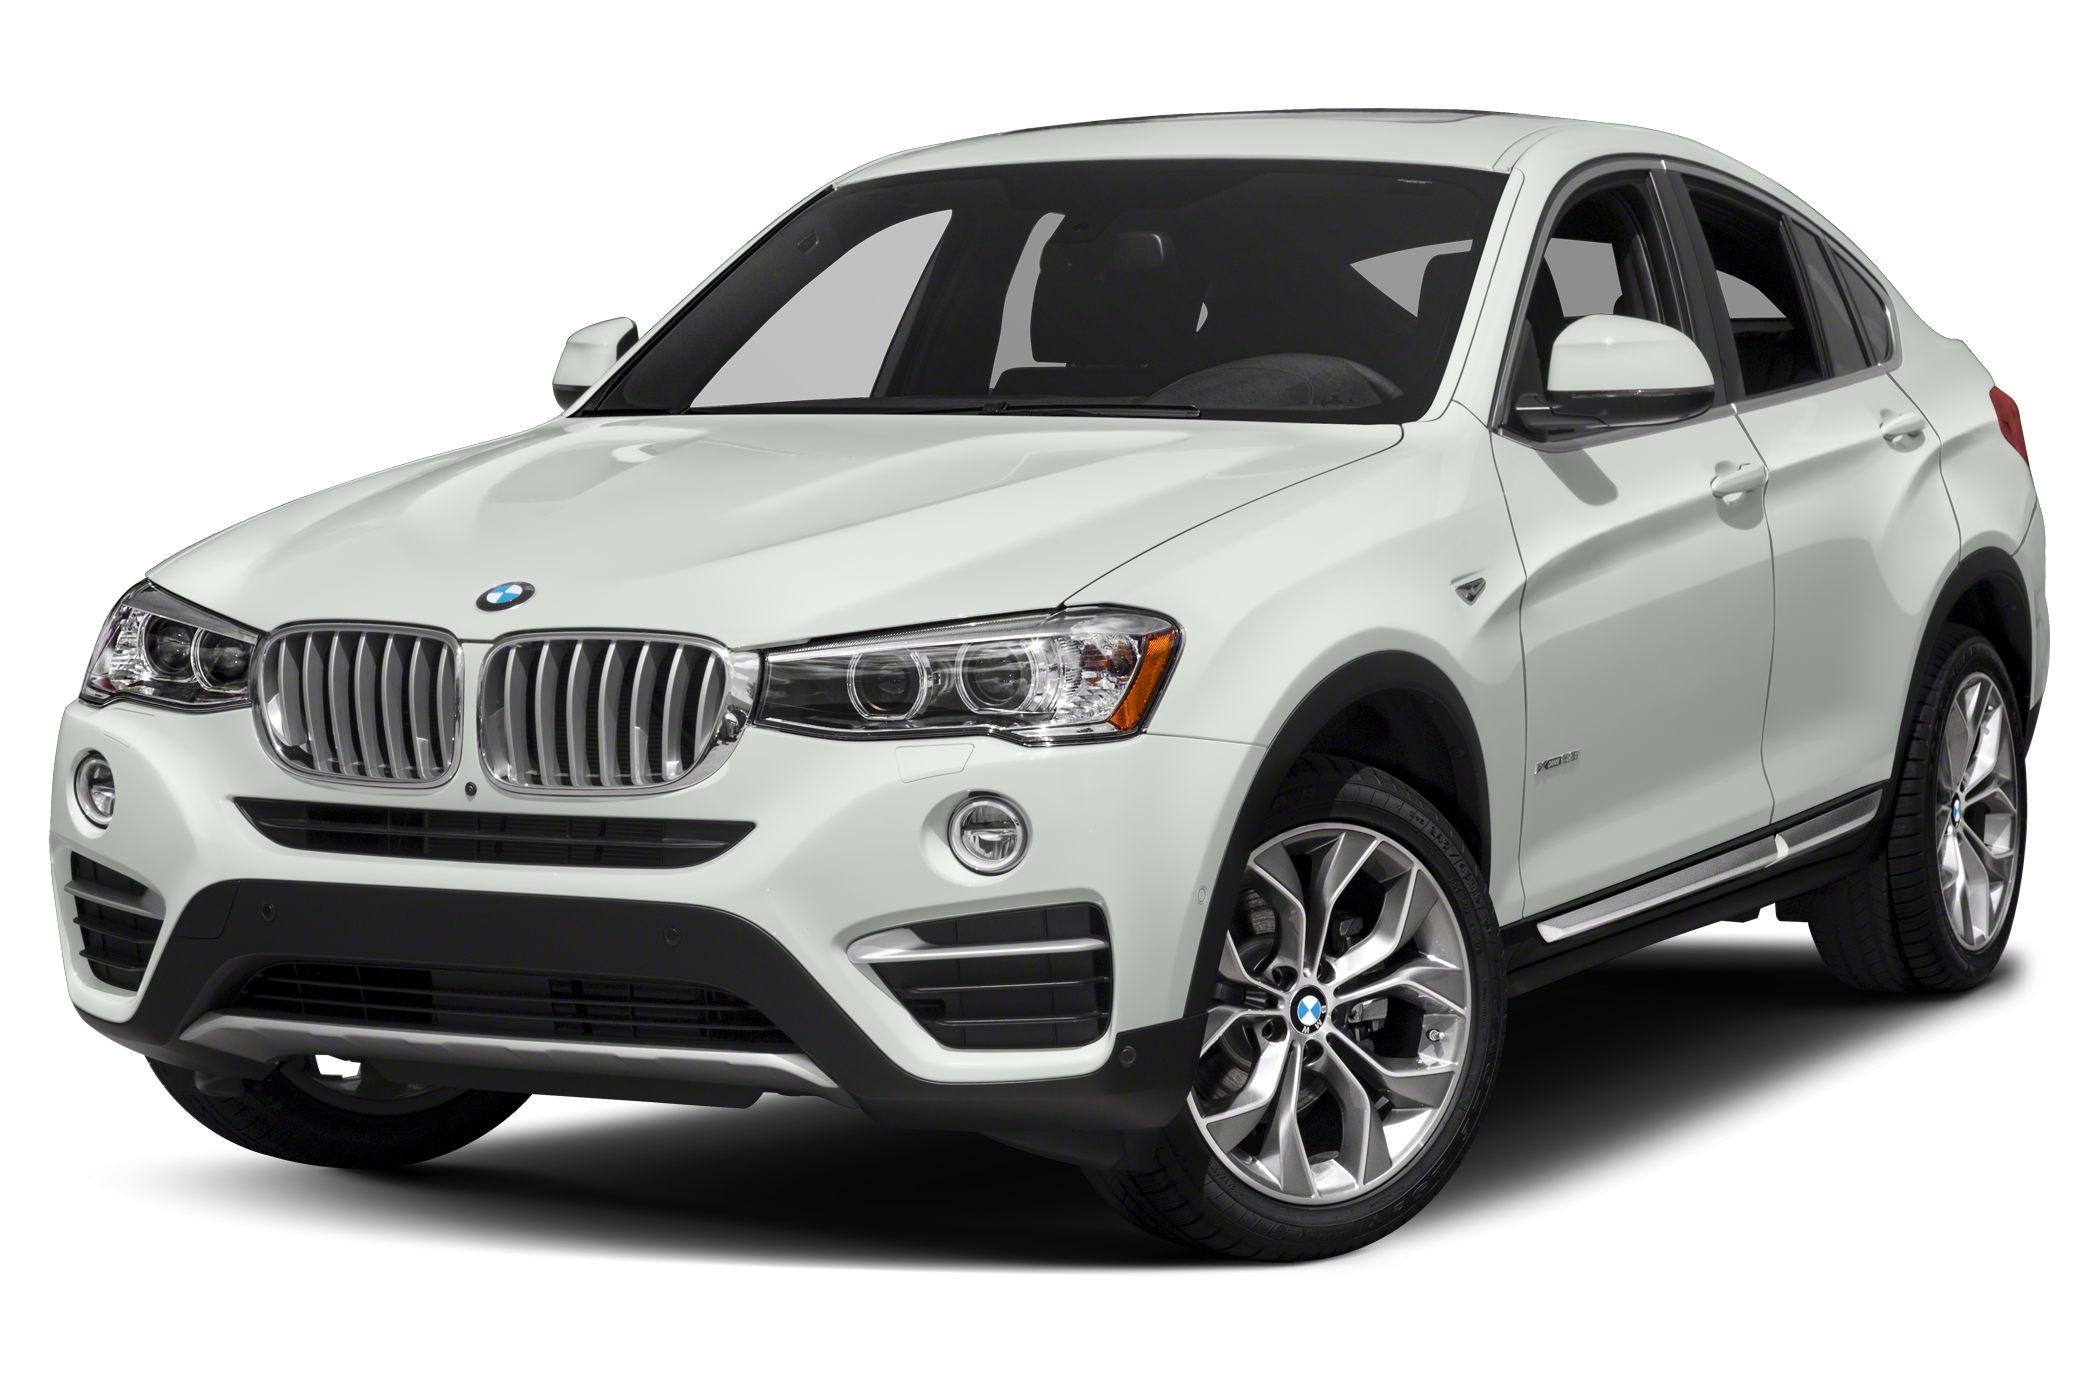 2018 BMW X4 xDrive28i 4dr